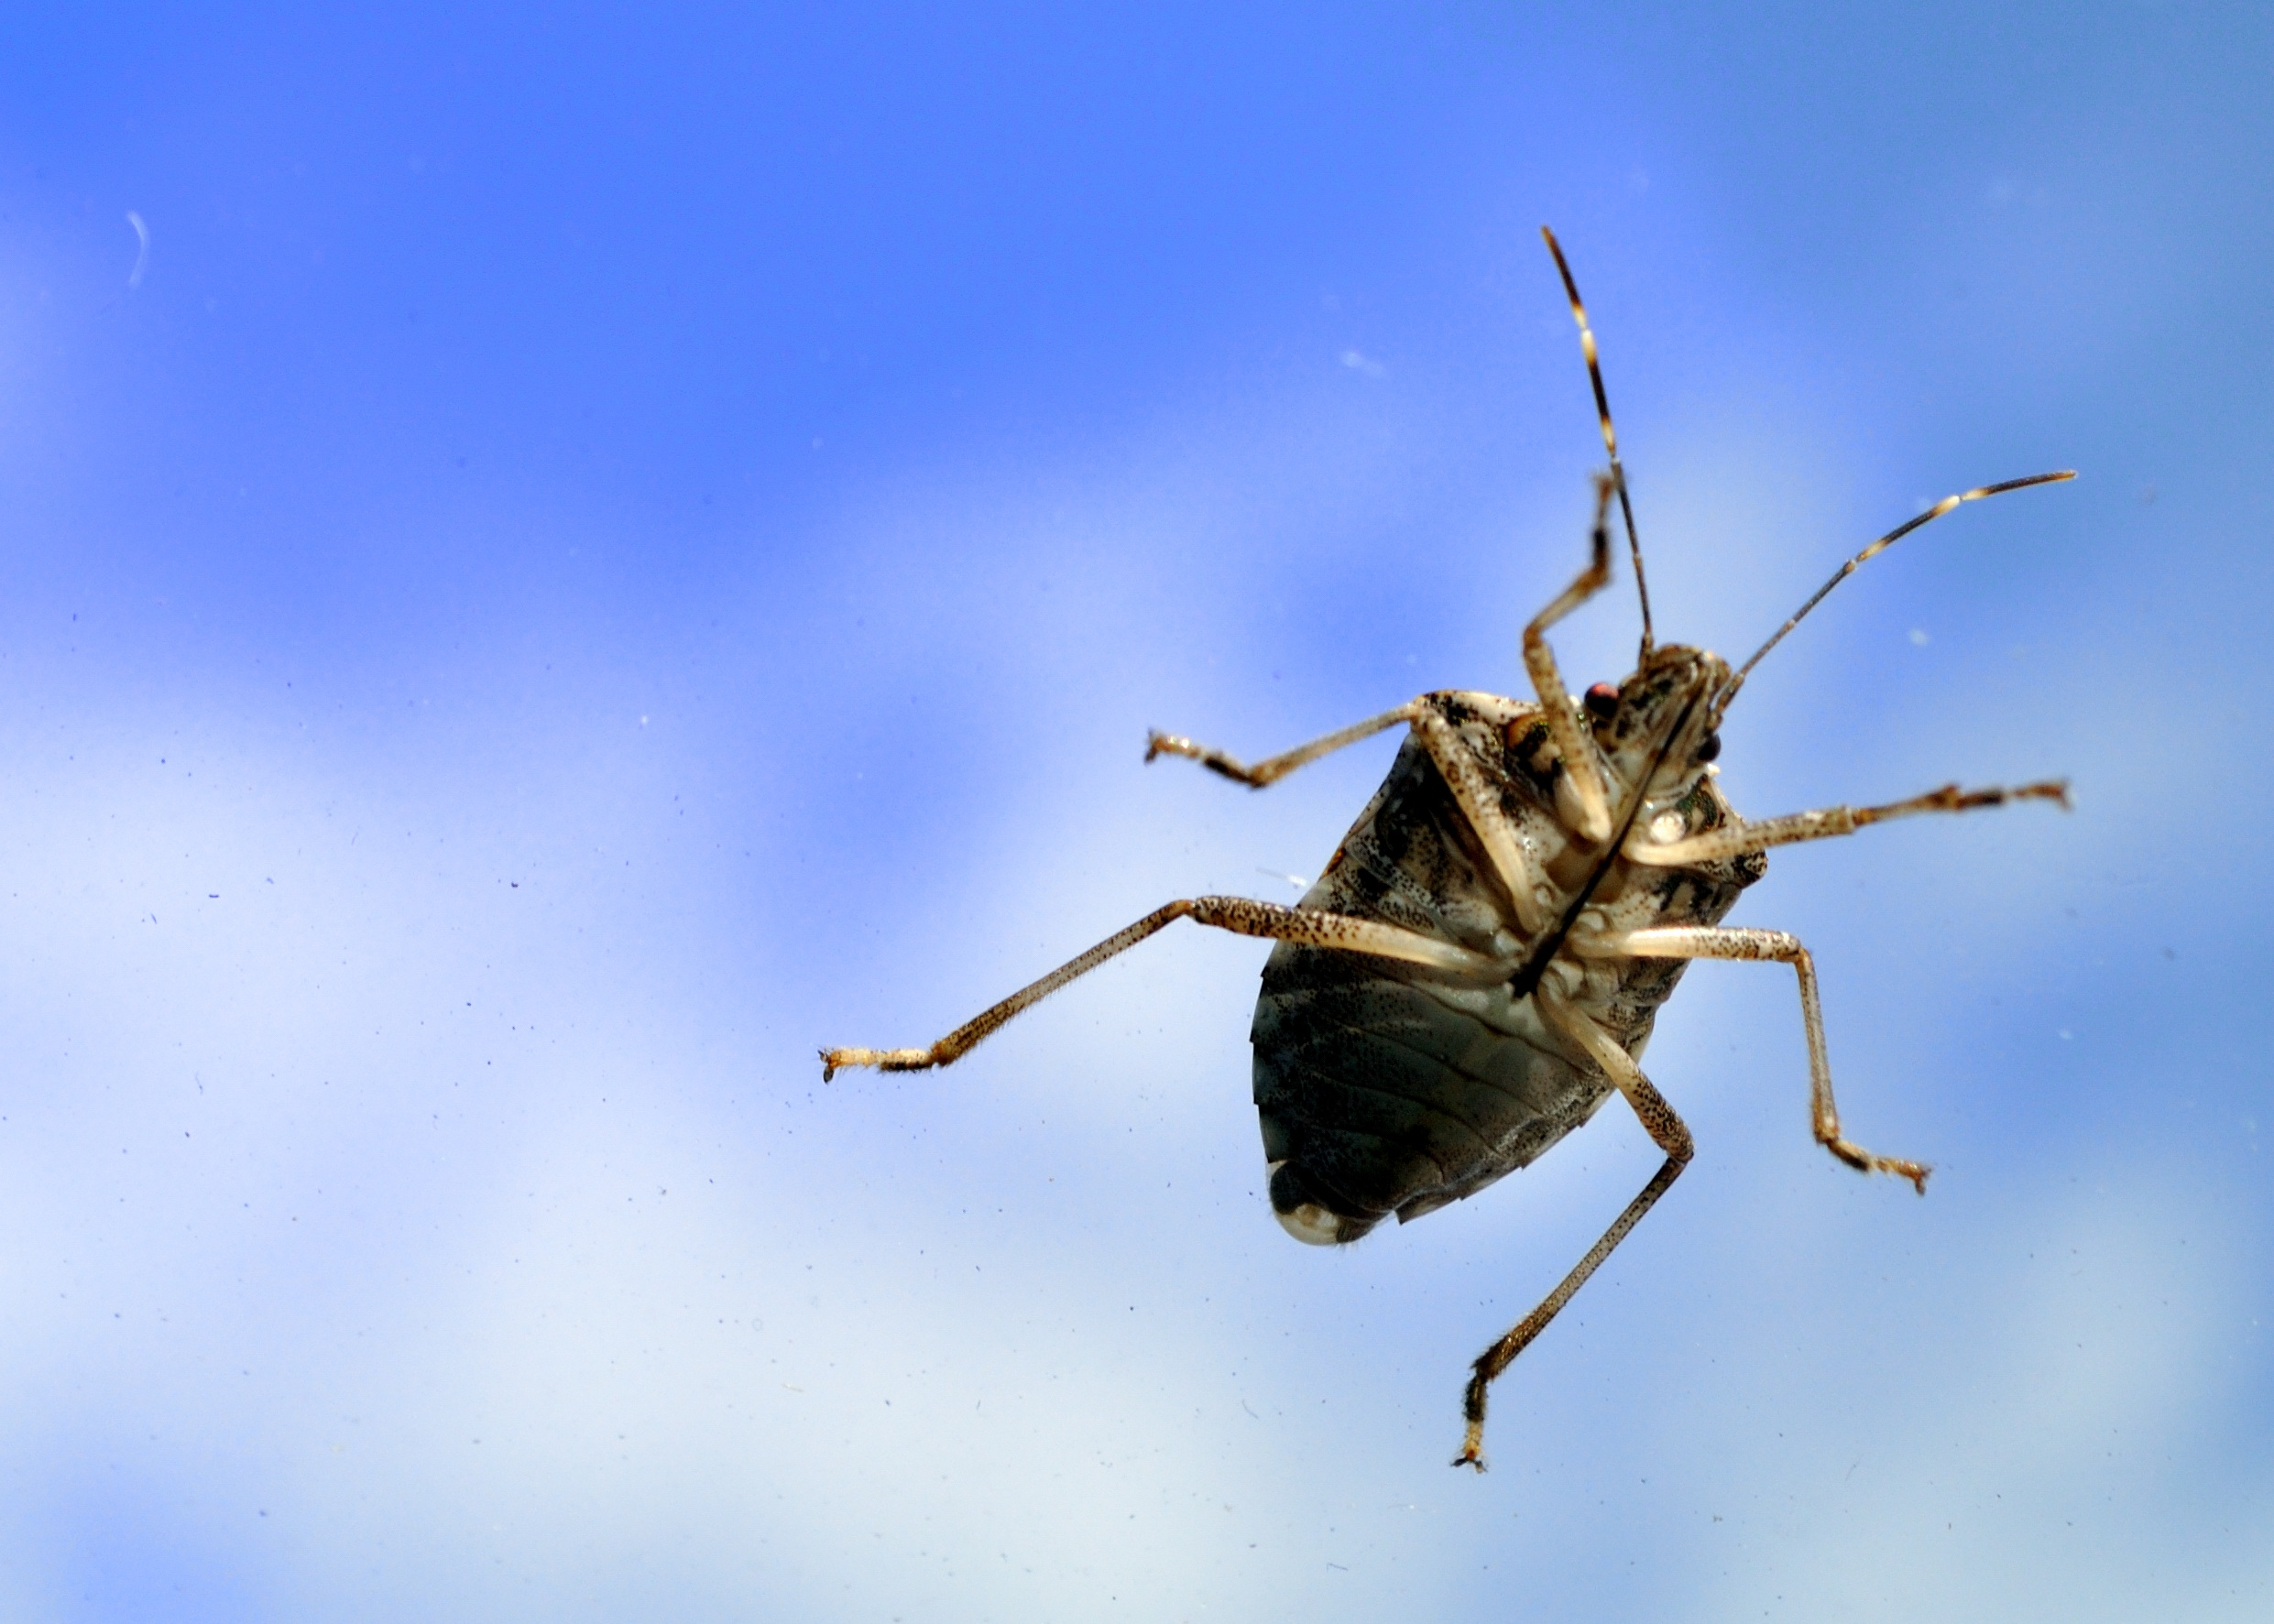 Bug cleaner